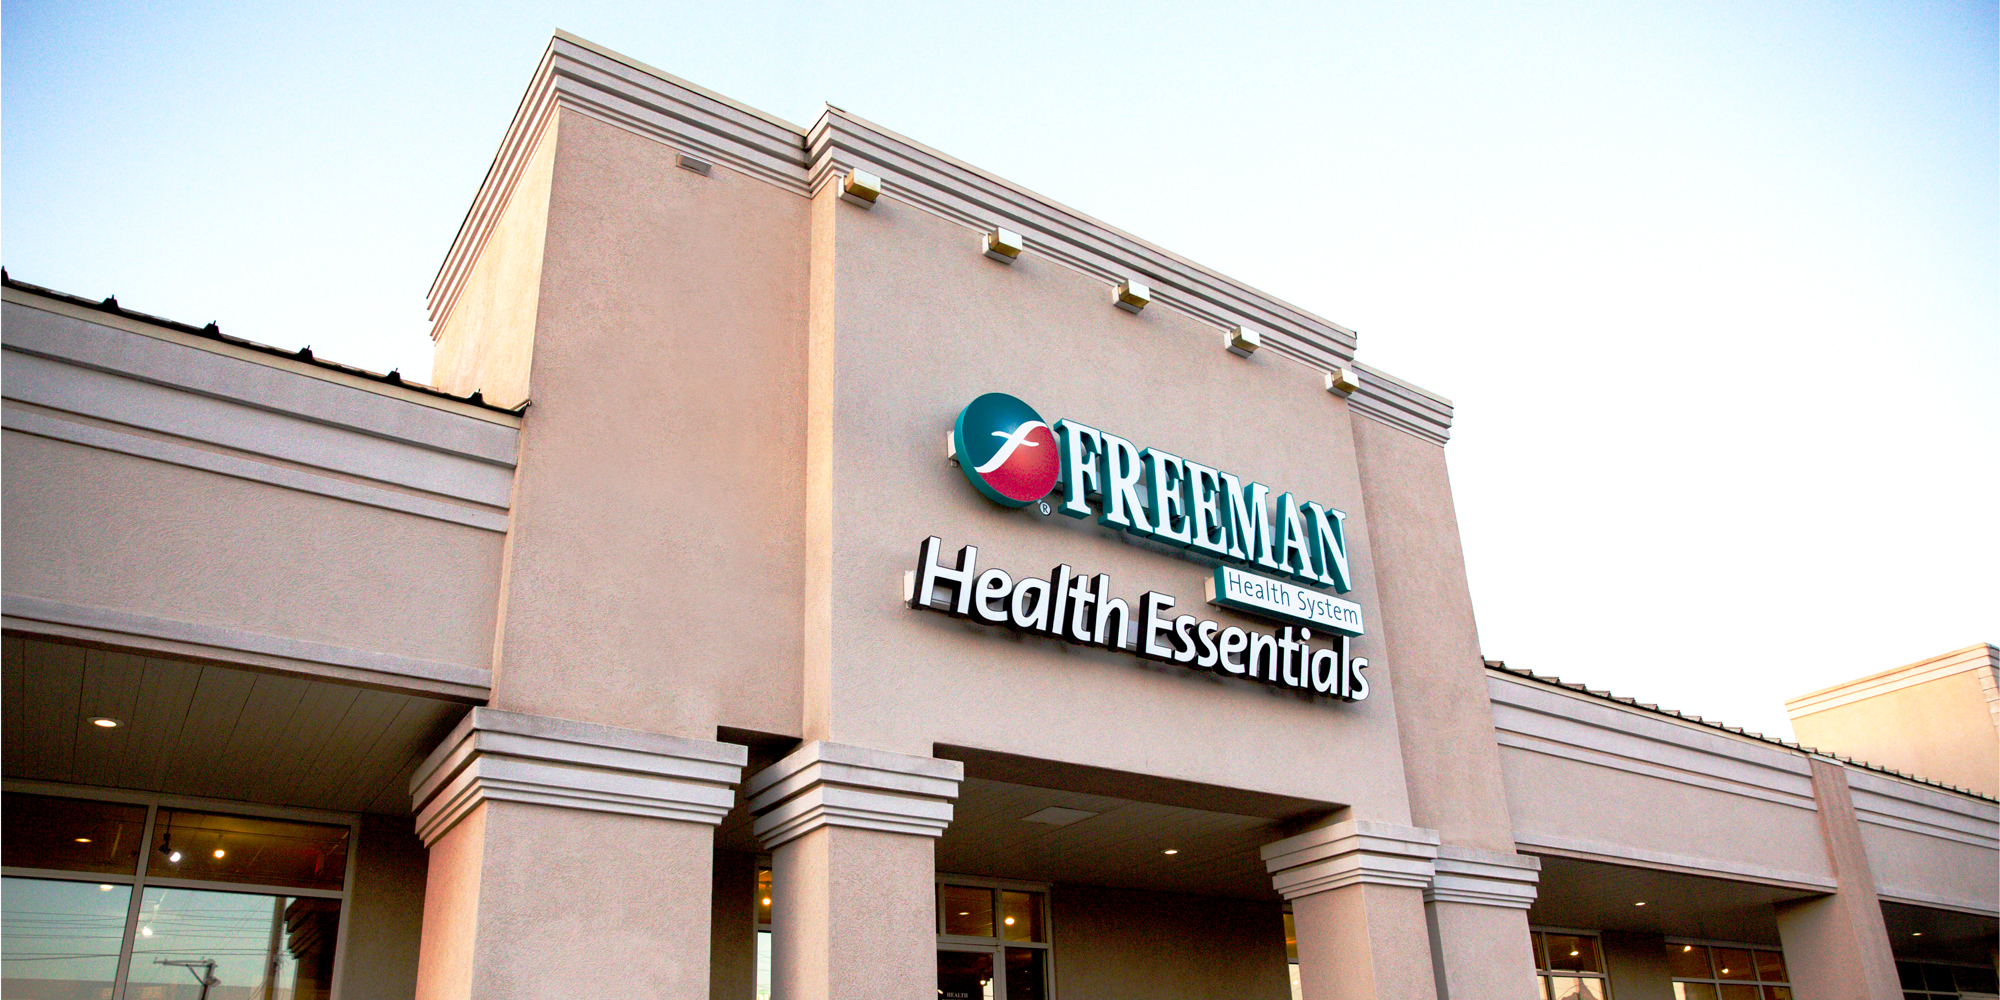 Freeman Health Essentials Joplin new cropped